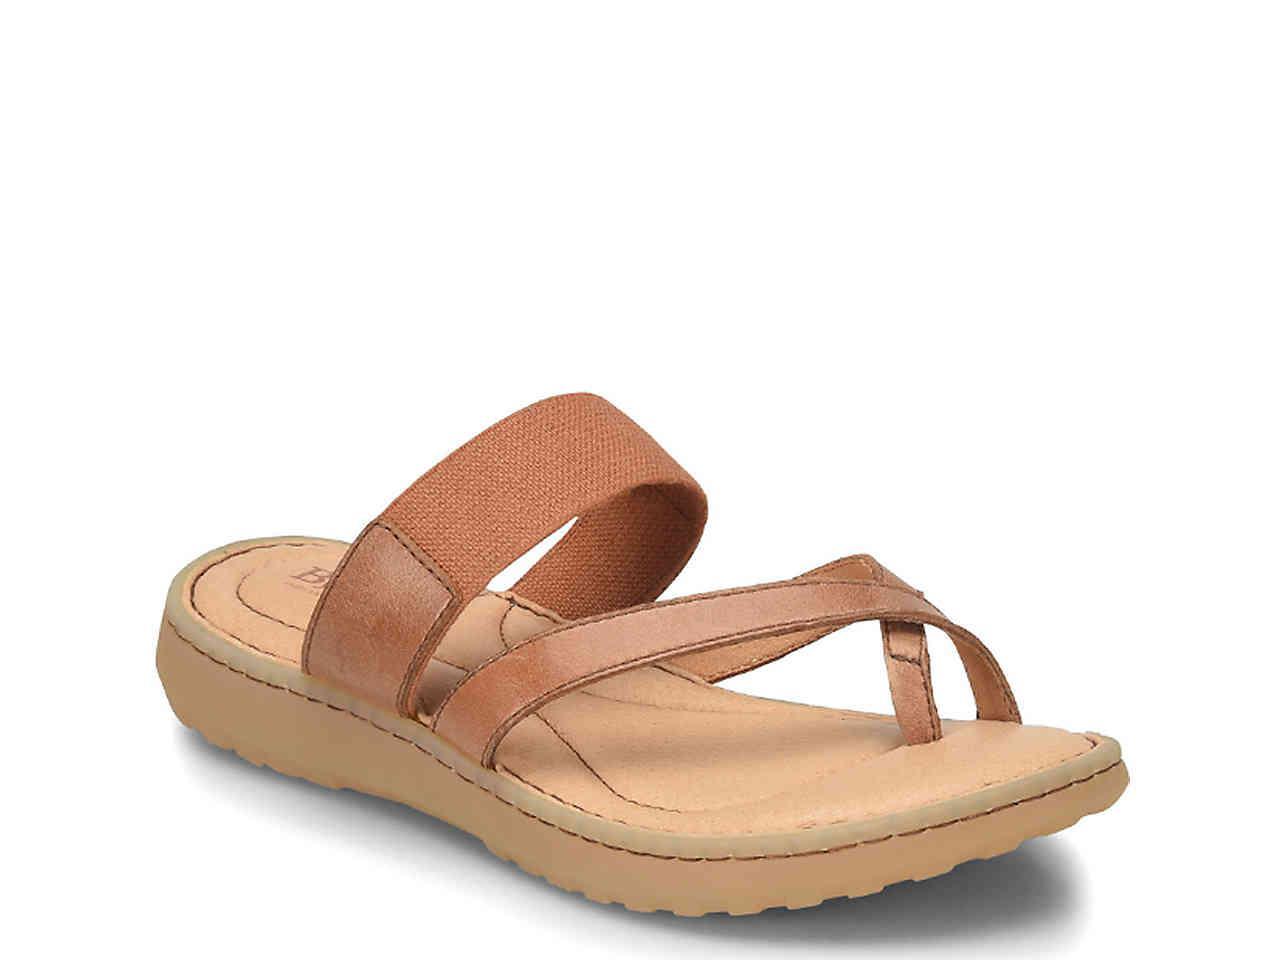 b0f9084efa61 Lyst - Born Arvid Flat Sandal in Brown